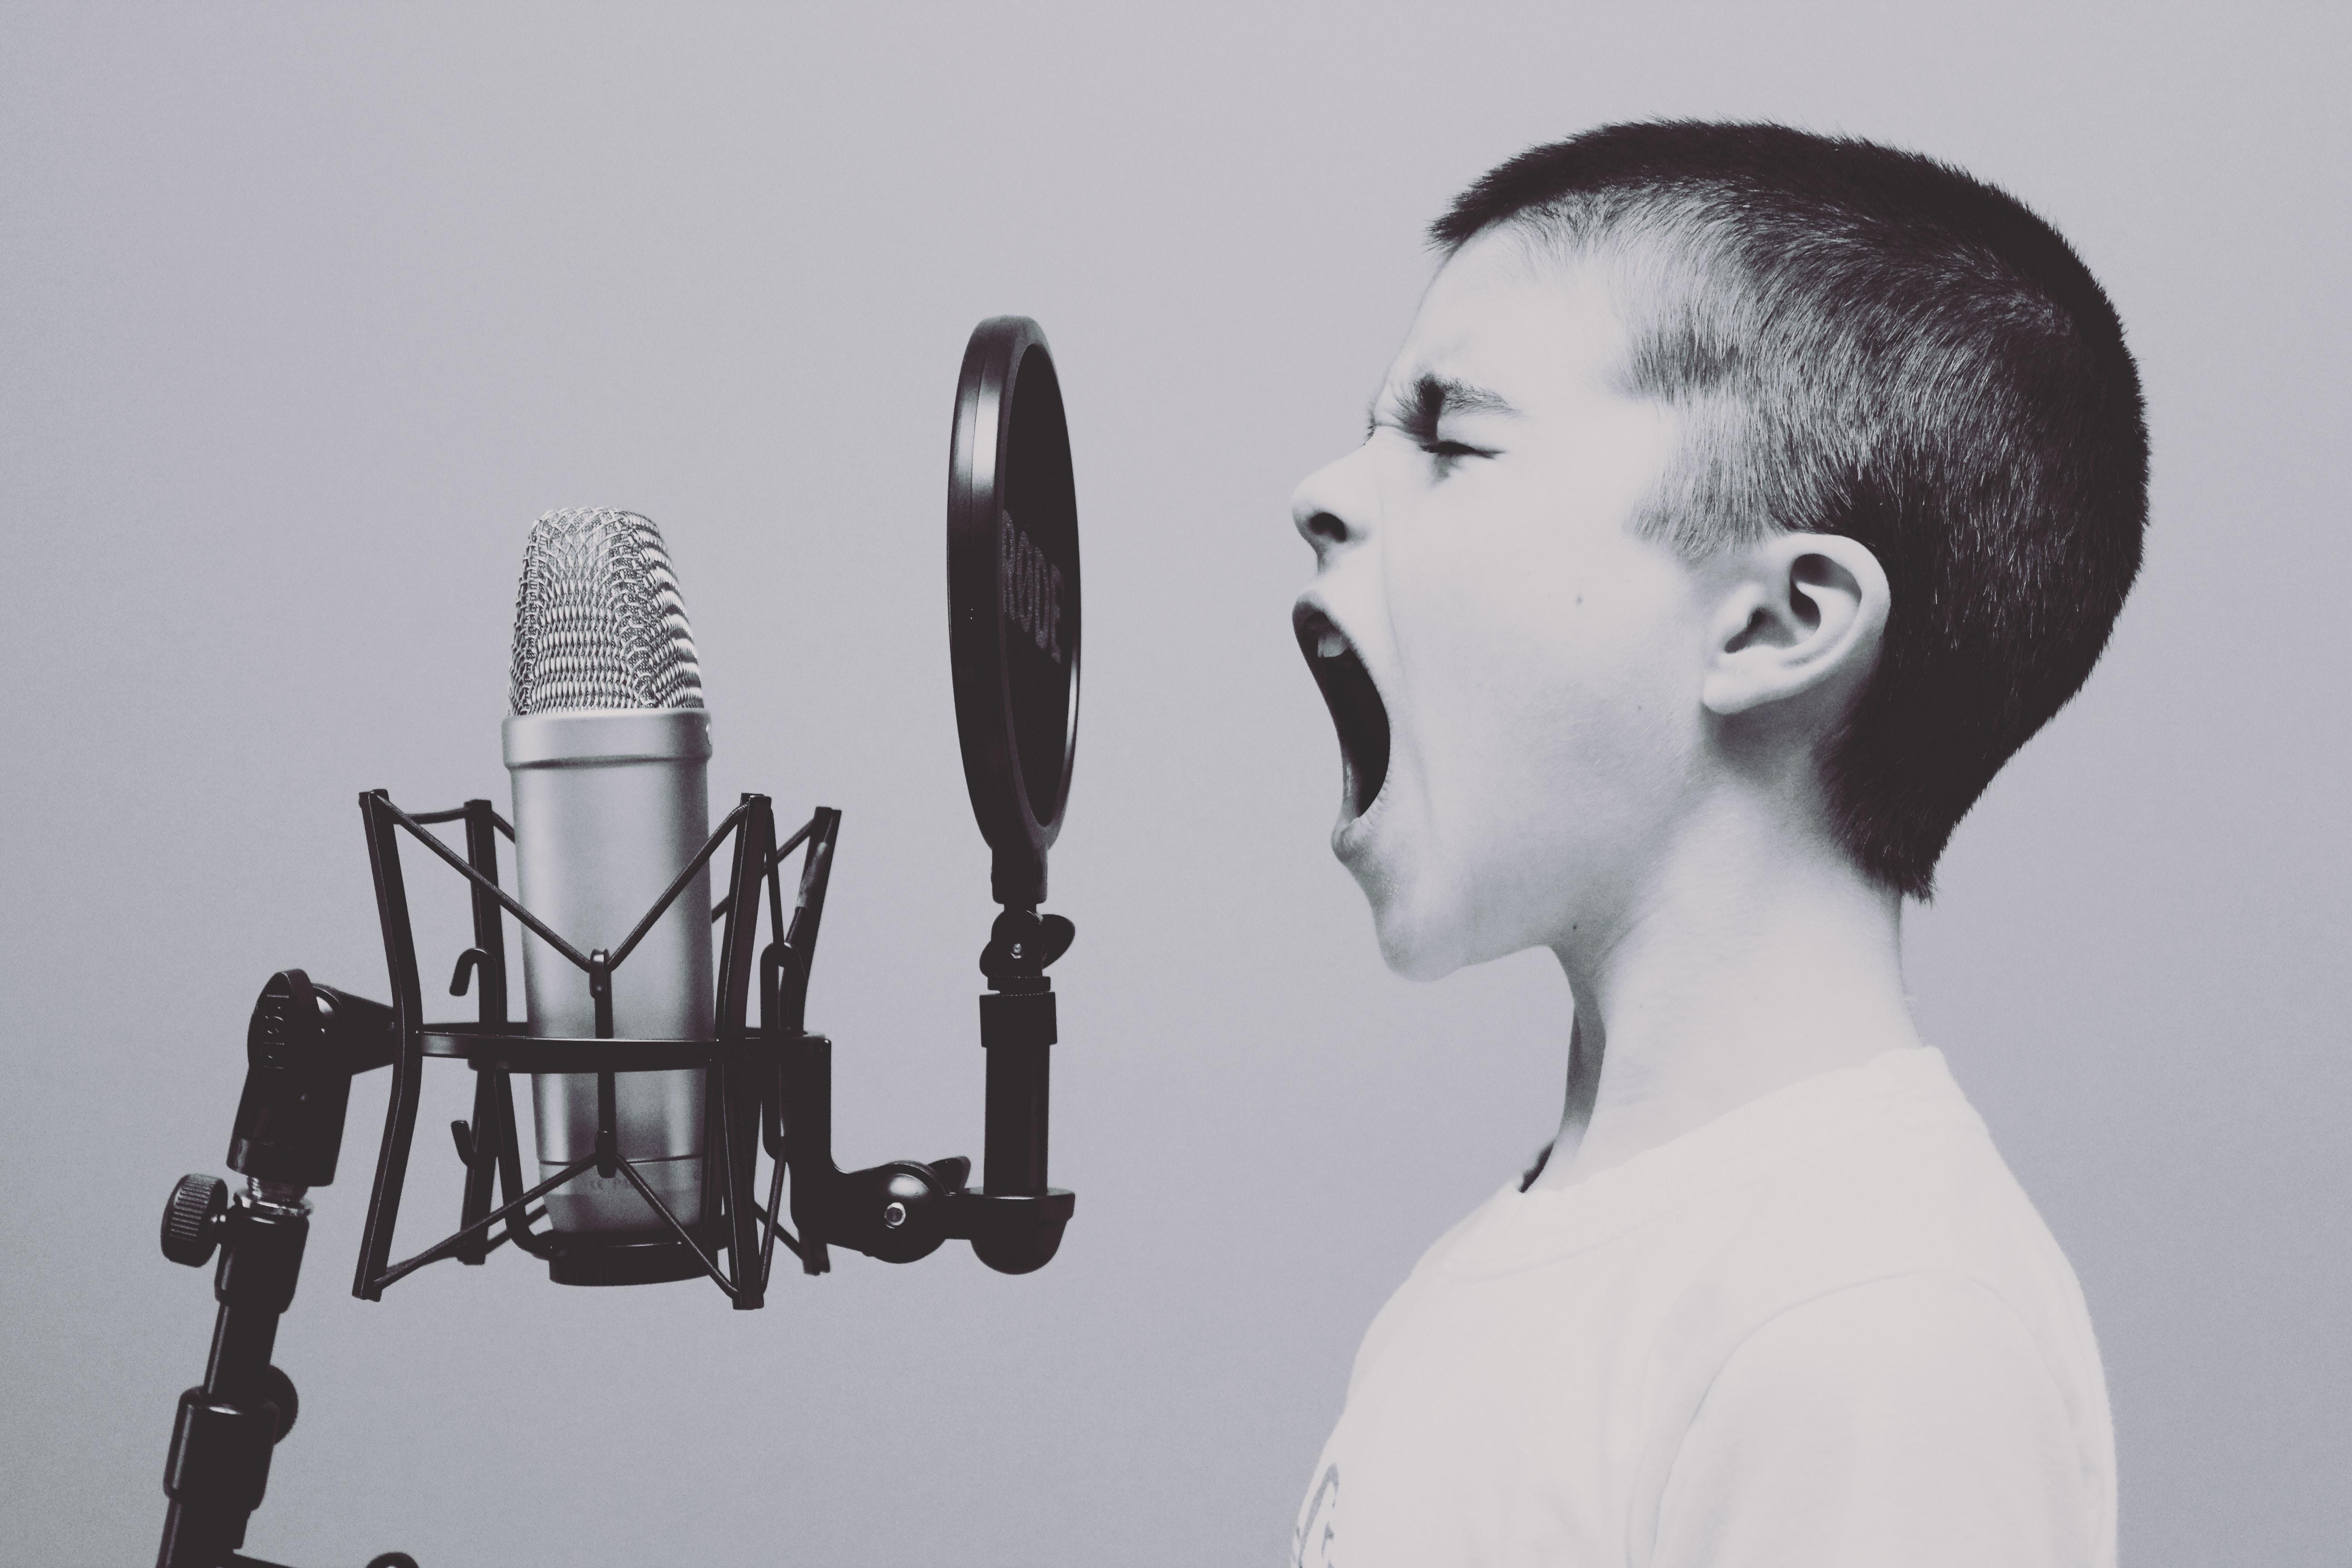 Boy with radio microphone